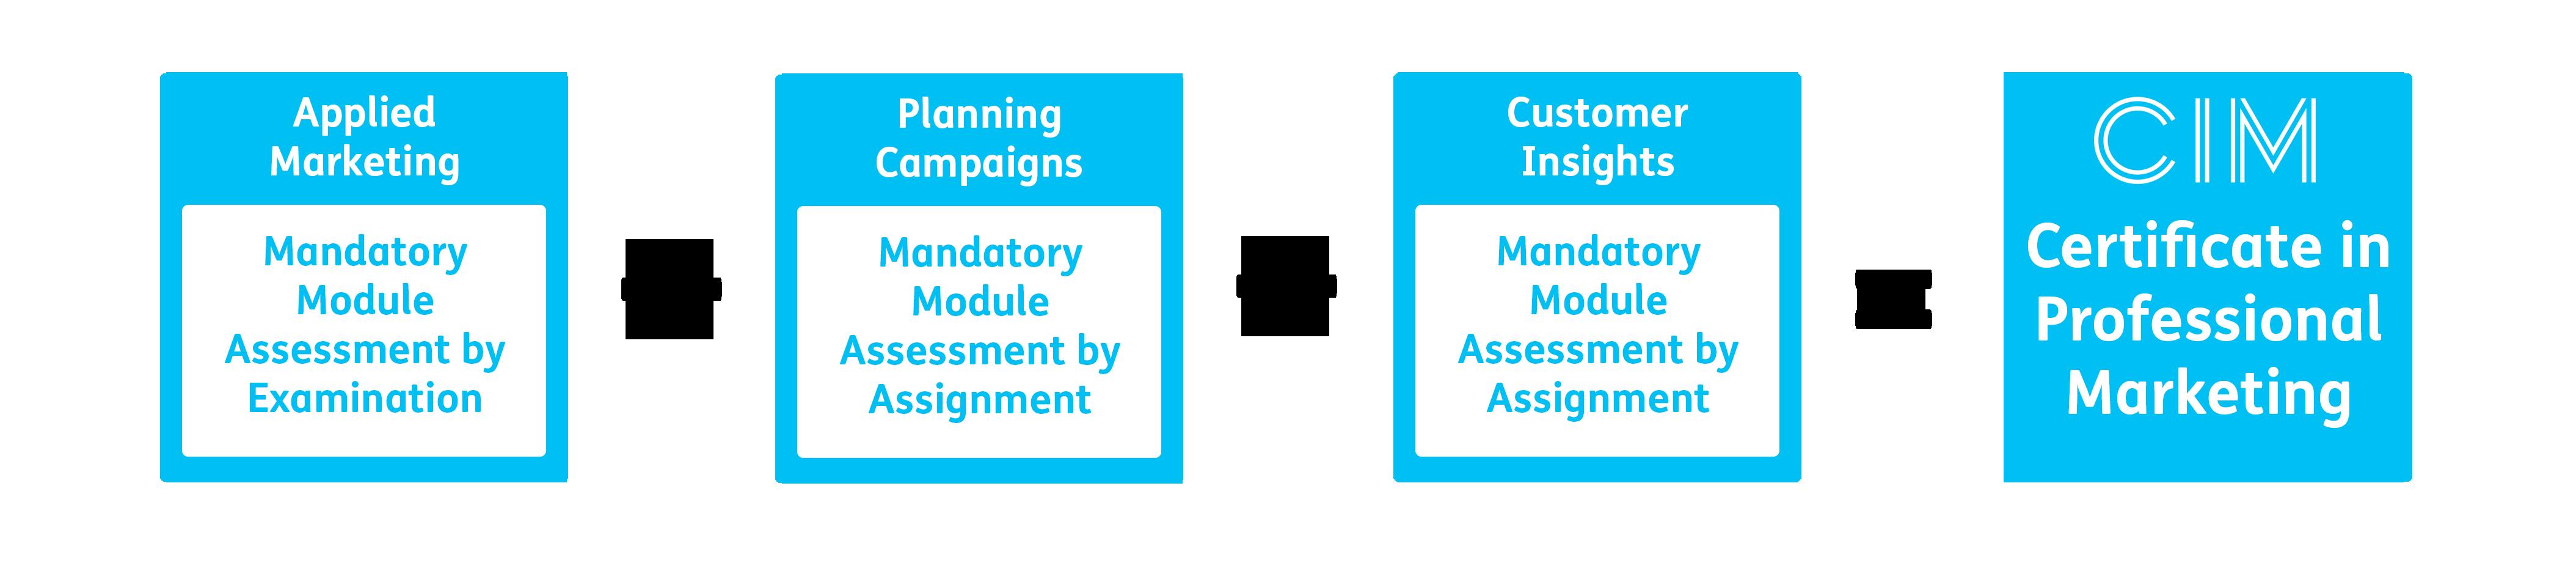 CIM Level 4 Certificate in Professional Marketing Structure